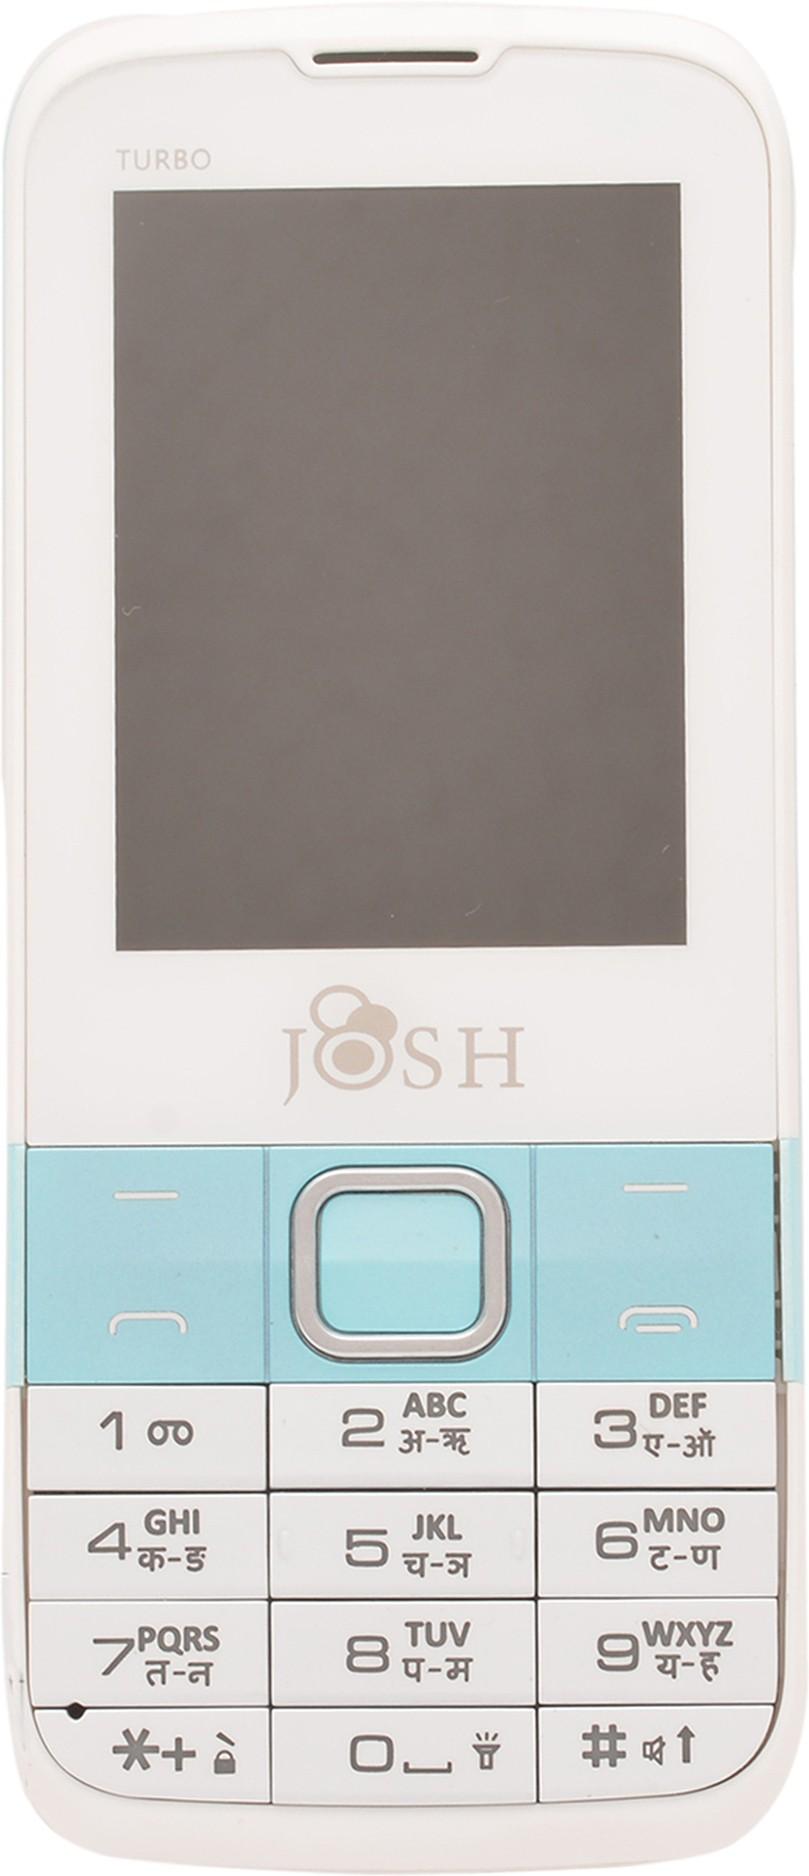 Josh Turbo(Whit & Blue)